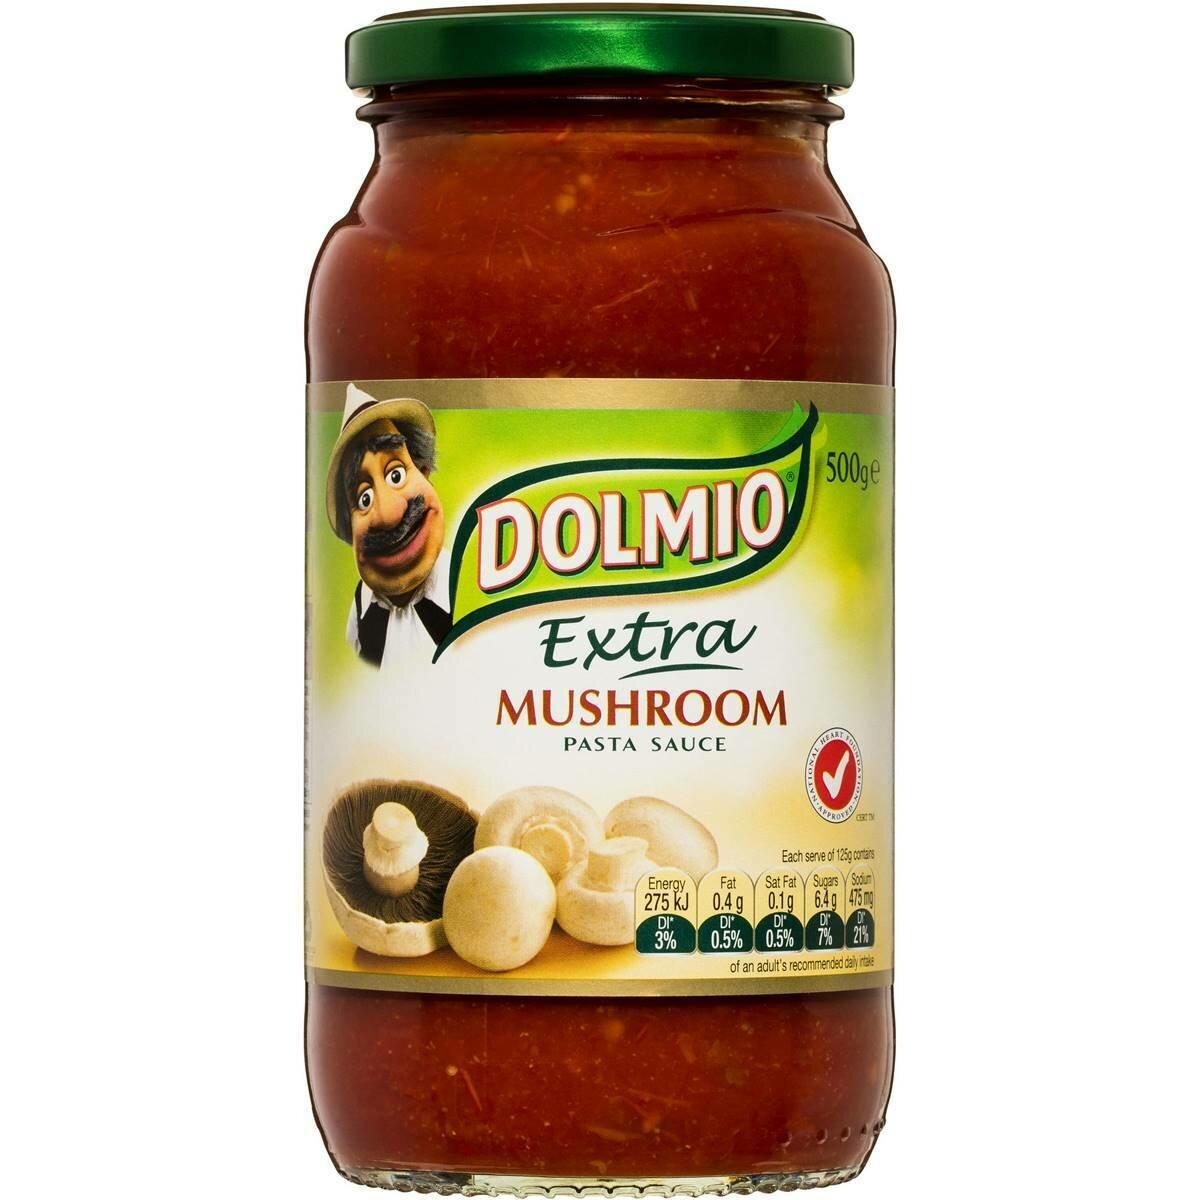 Dolmio Extra Mushroom Pasta Sauce